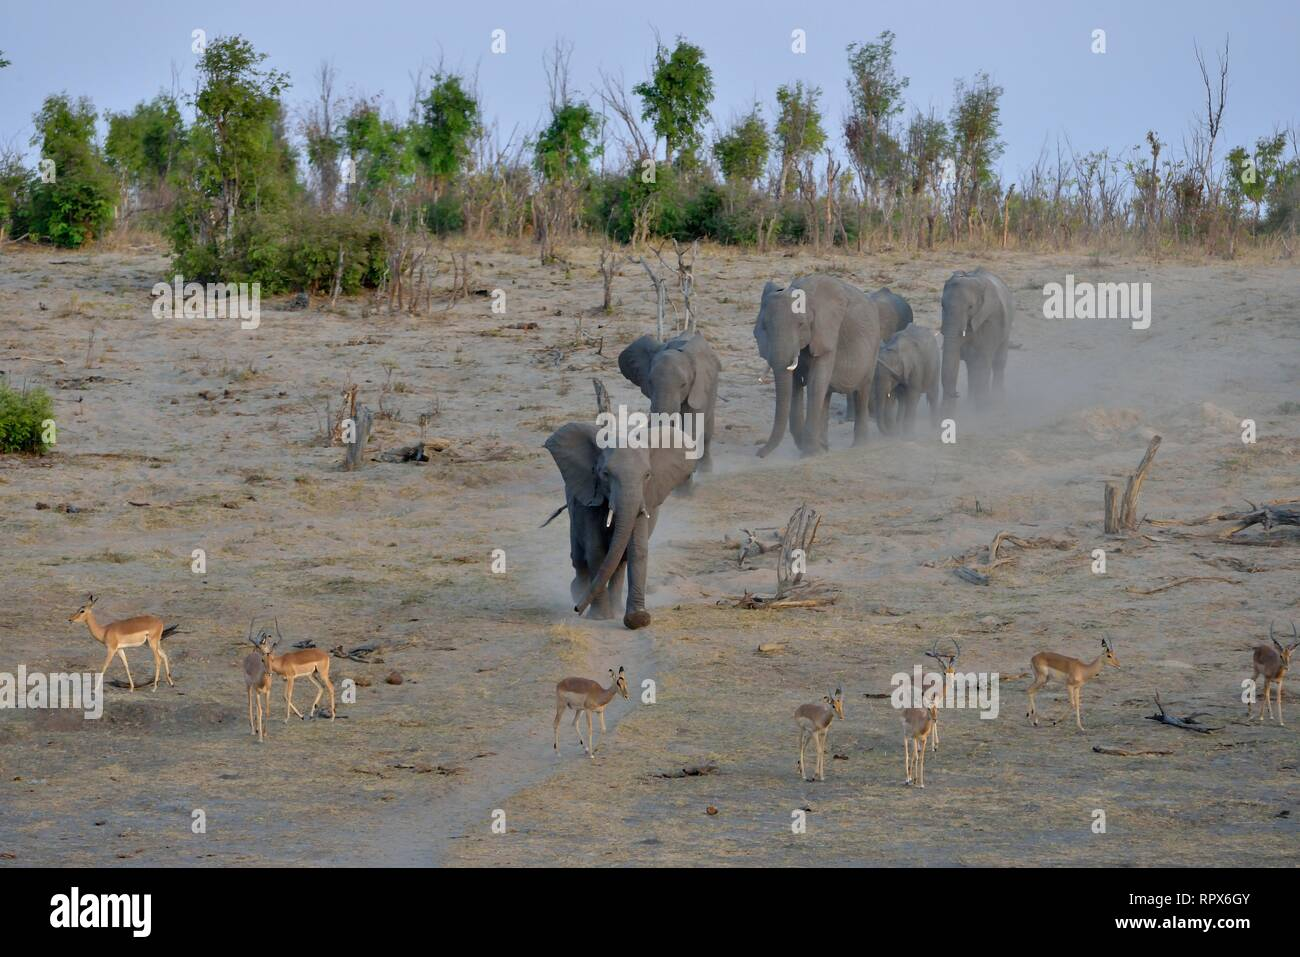 zoology, mammal (mammalia), elephant (Loxodonta africana) near the Somalisa camp, Hwange National Park, Additional-Rights-Clearance-Info-Not-Available - Stock Image